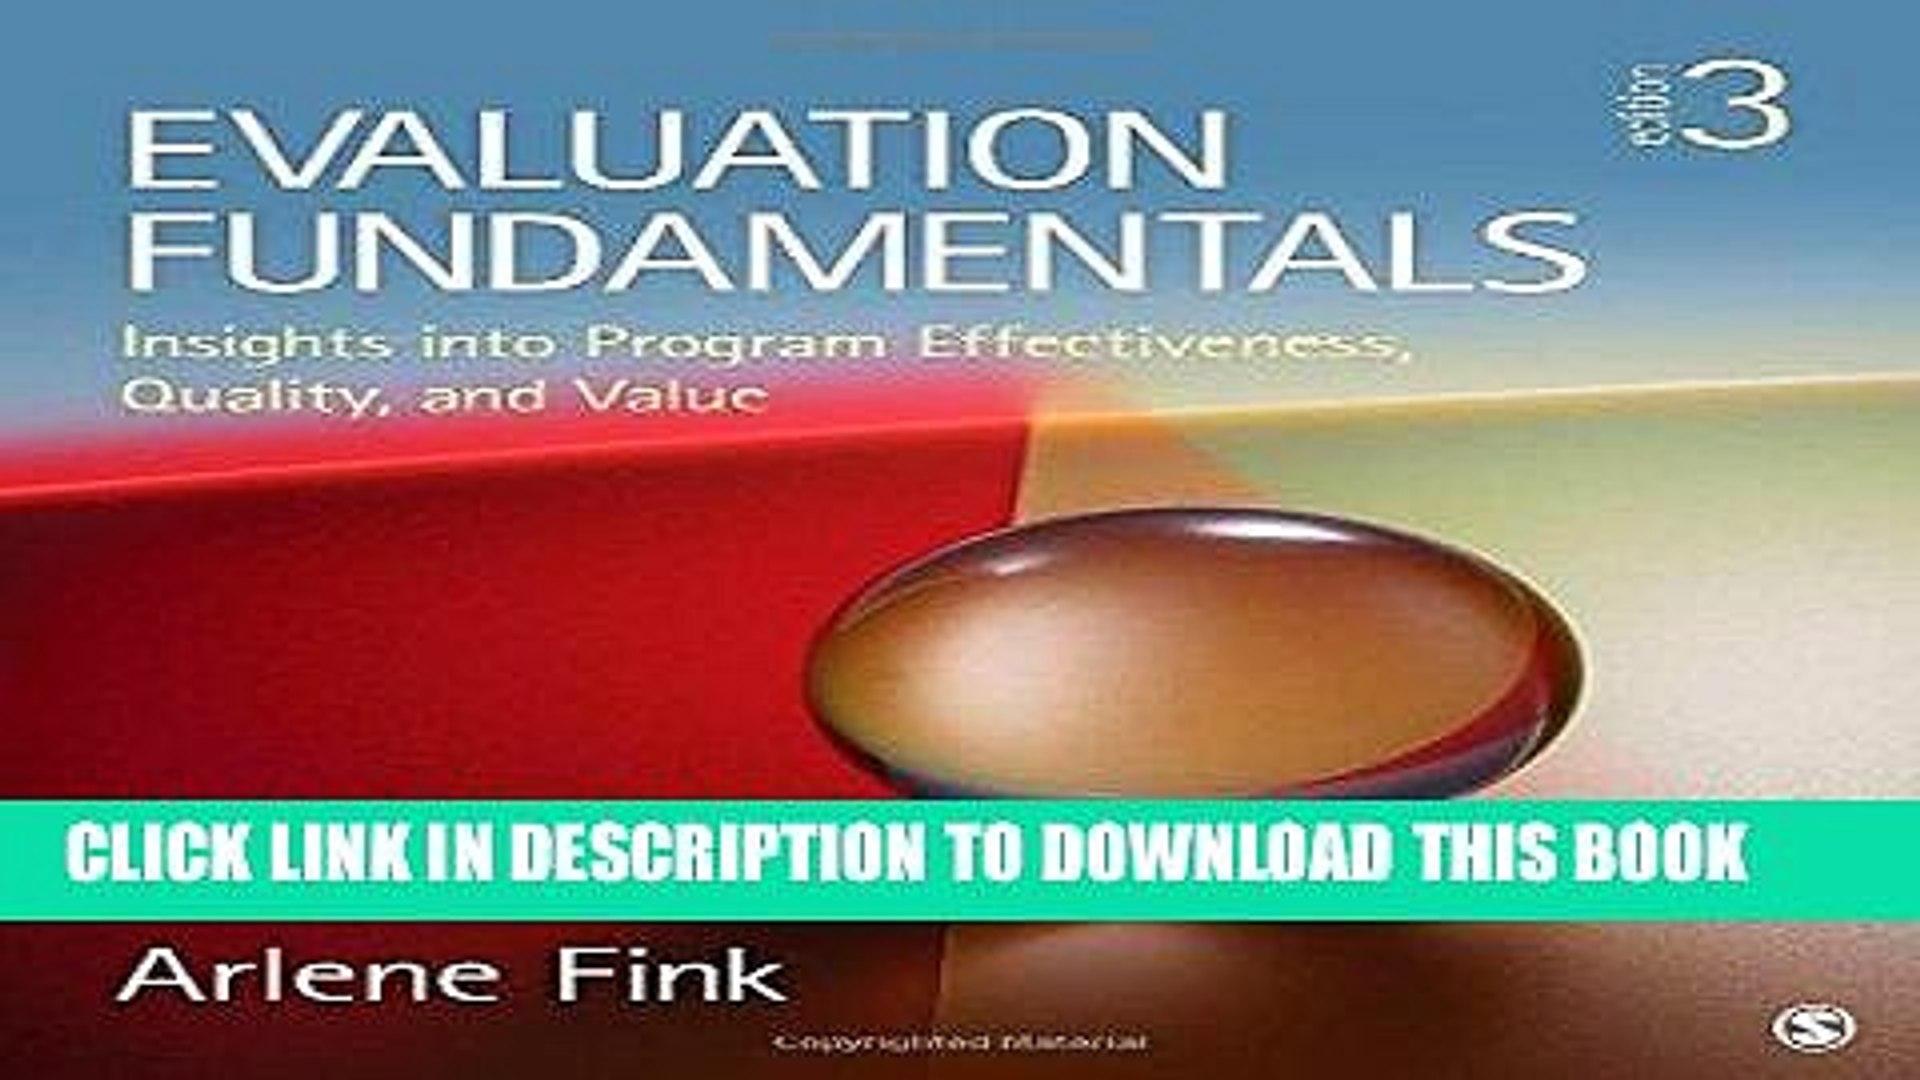 Evaluation Fundamentals >> Pdf Evaluation Fundamentals Insights Into Program Effectiveness Quality And Value Full Online